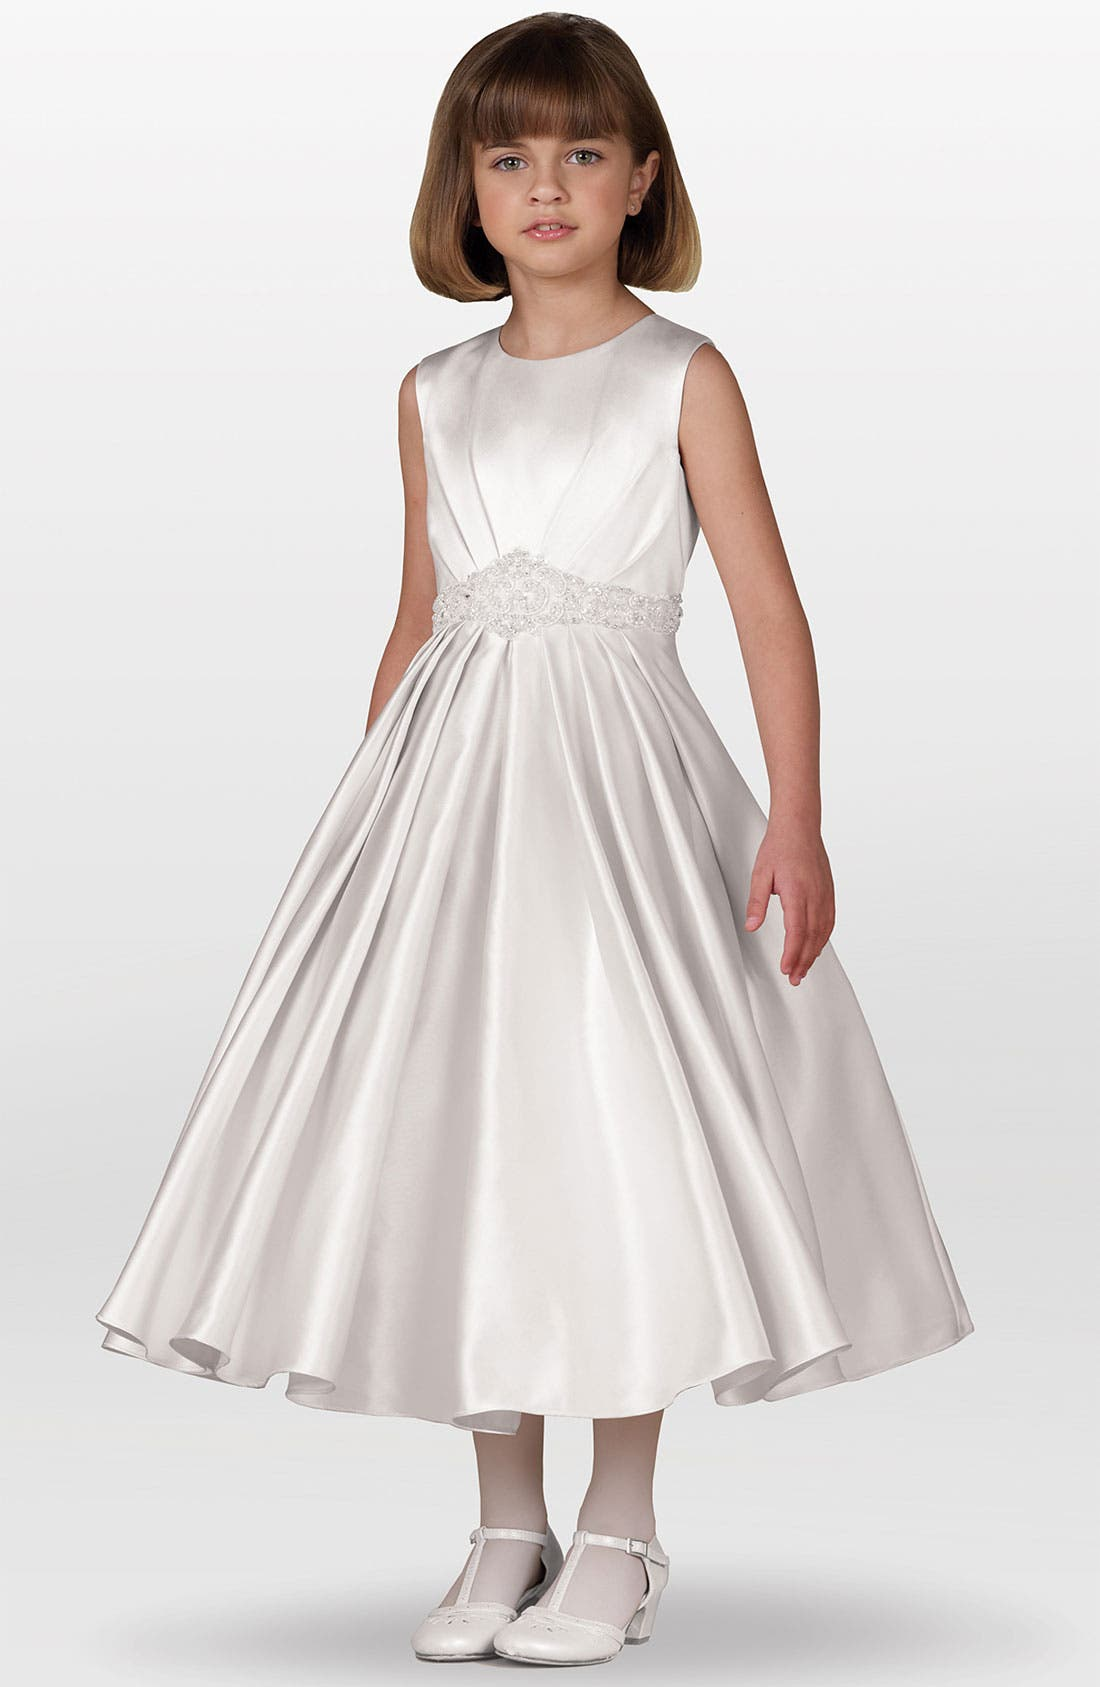 Main Image - Joan Calabrese for Mon Cheri Jeweled Waist Dress (Little Girls & Big Girls)